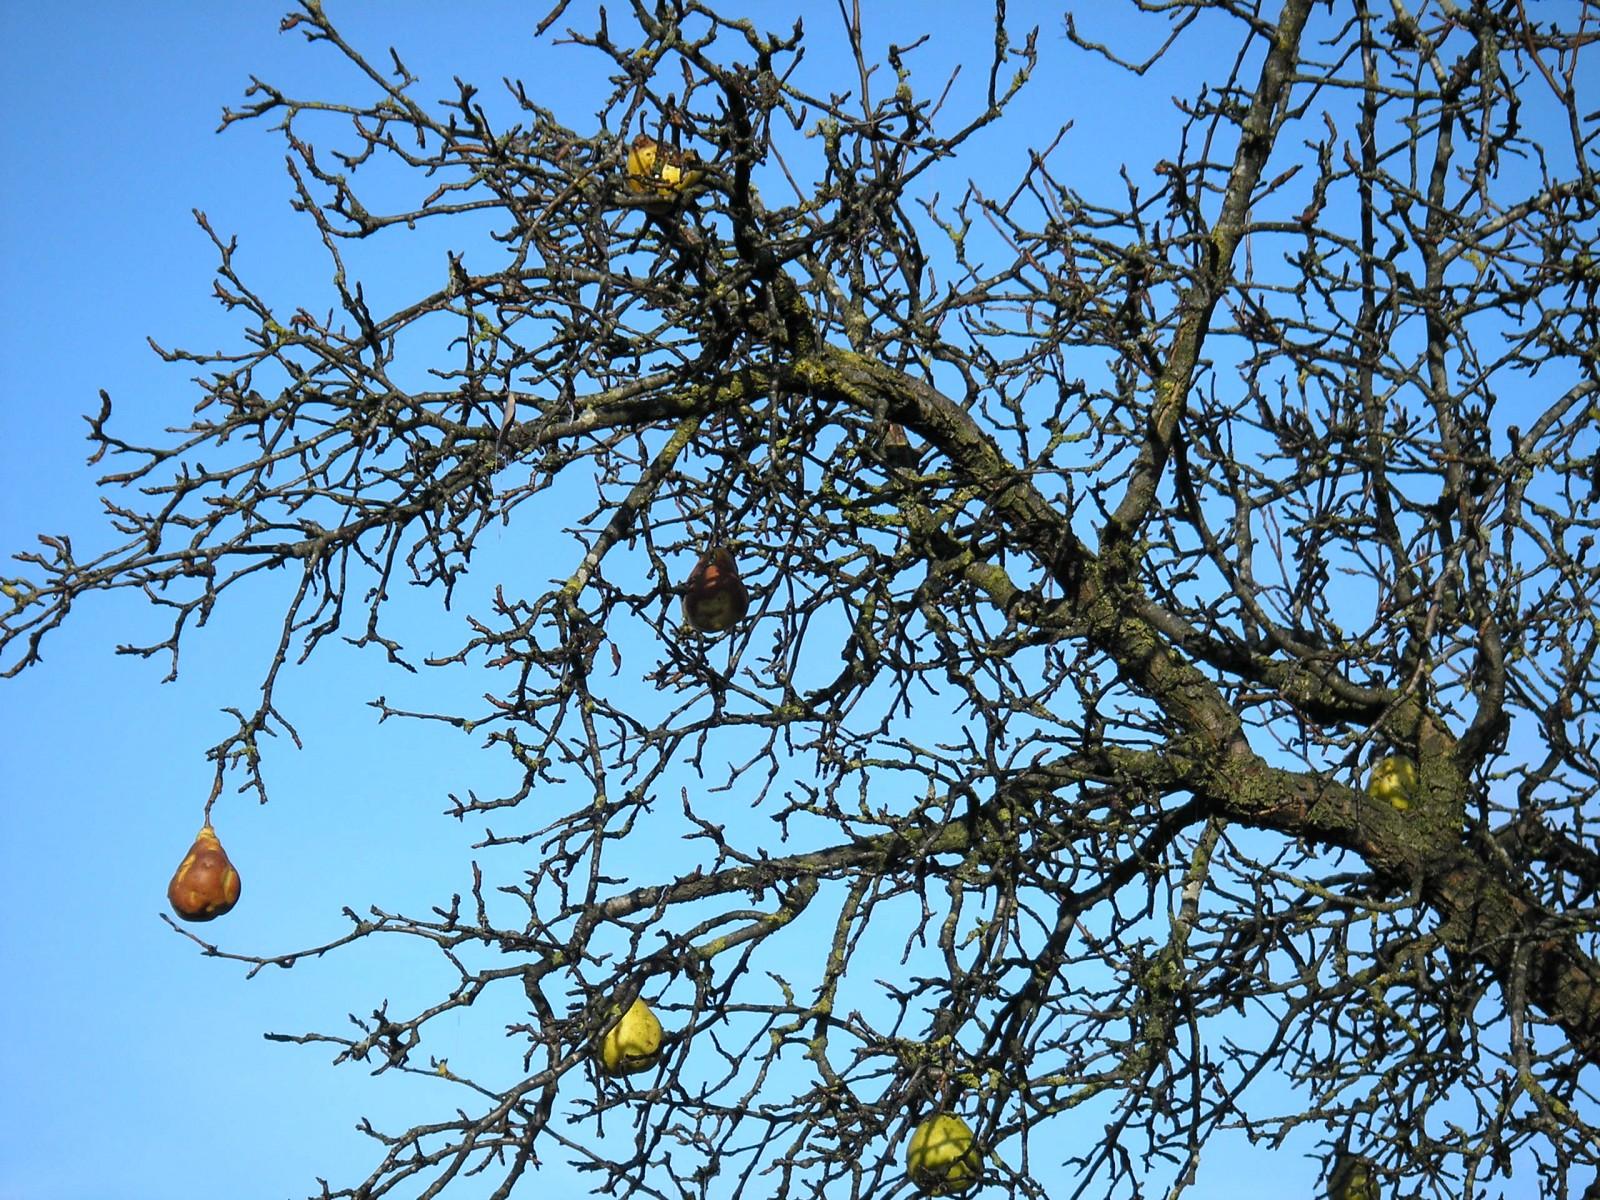 Apfelbaum entlang der Bahntrasse